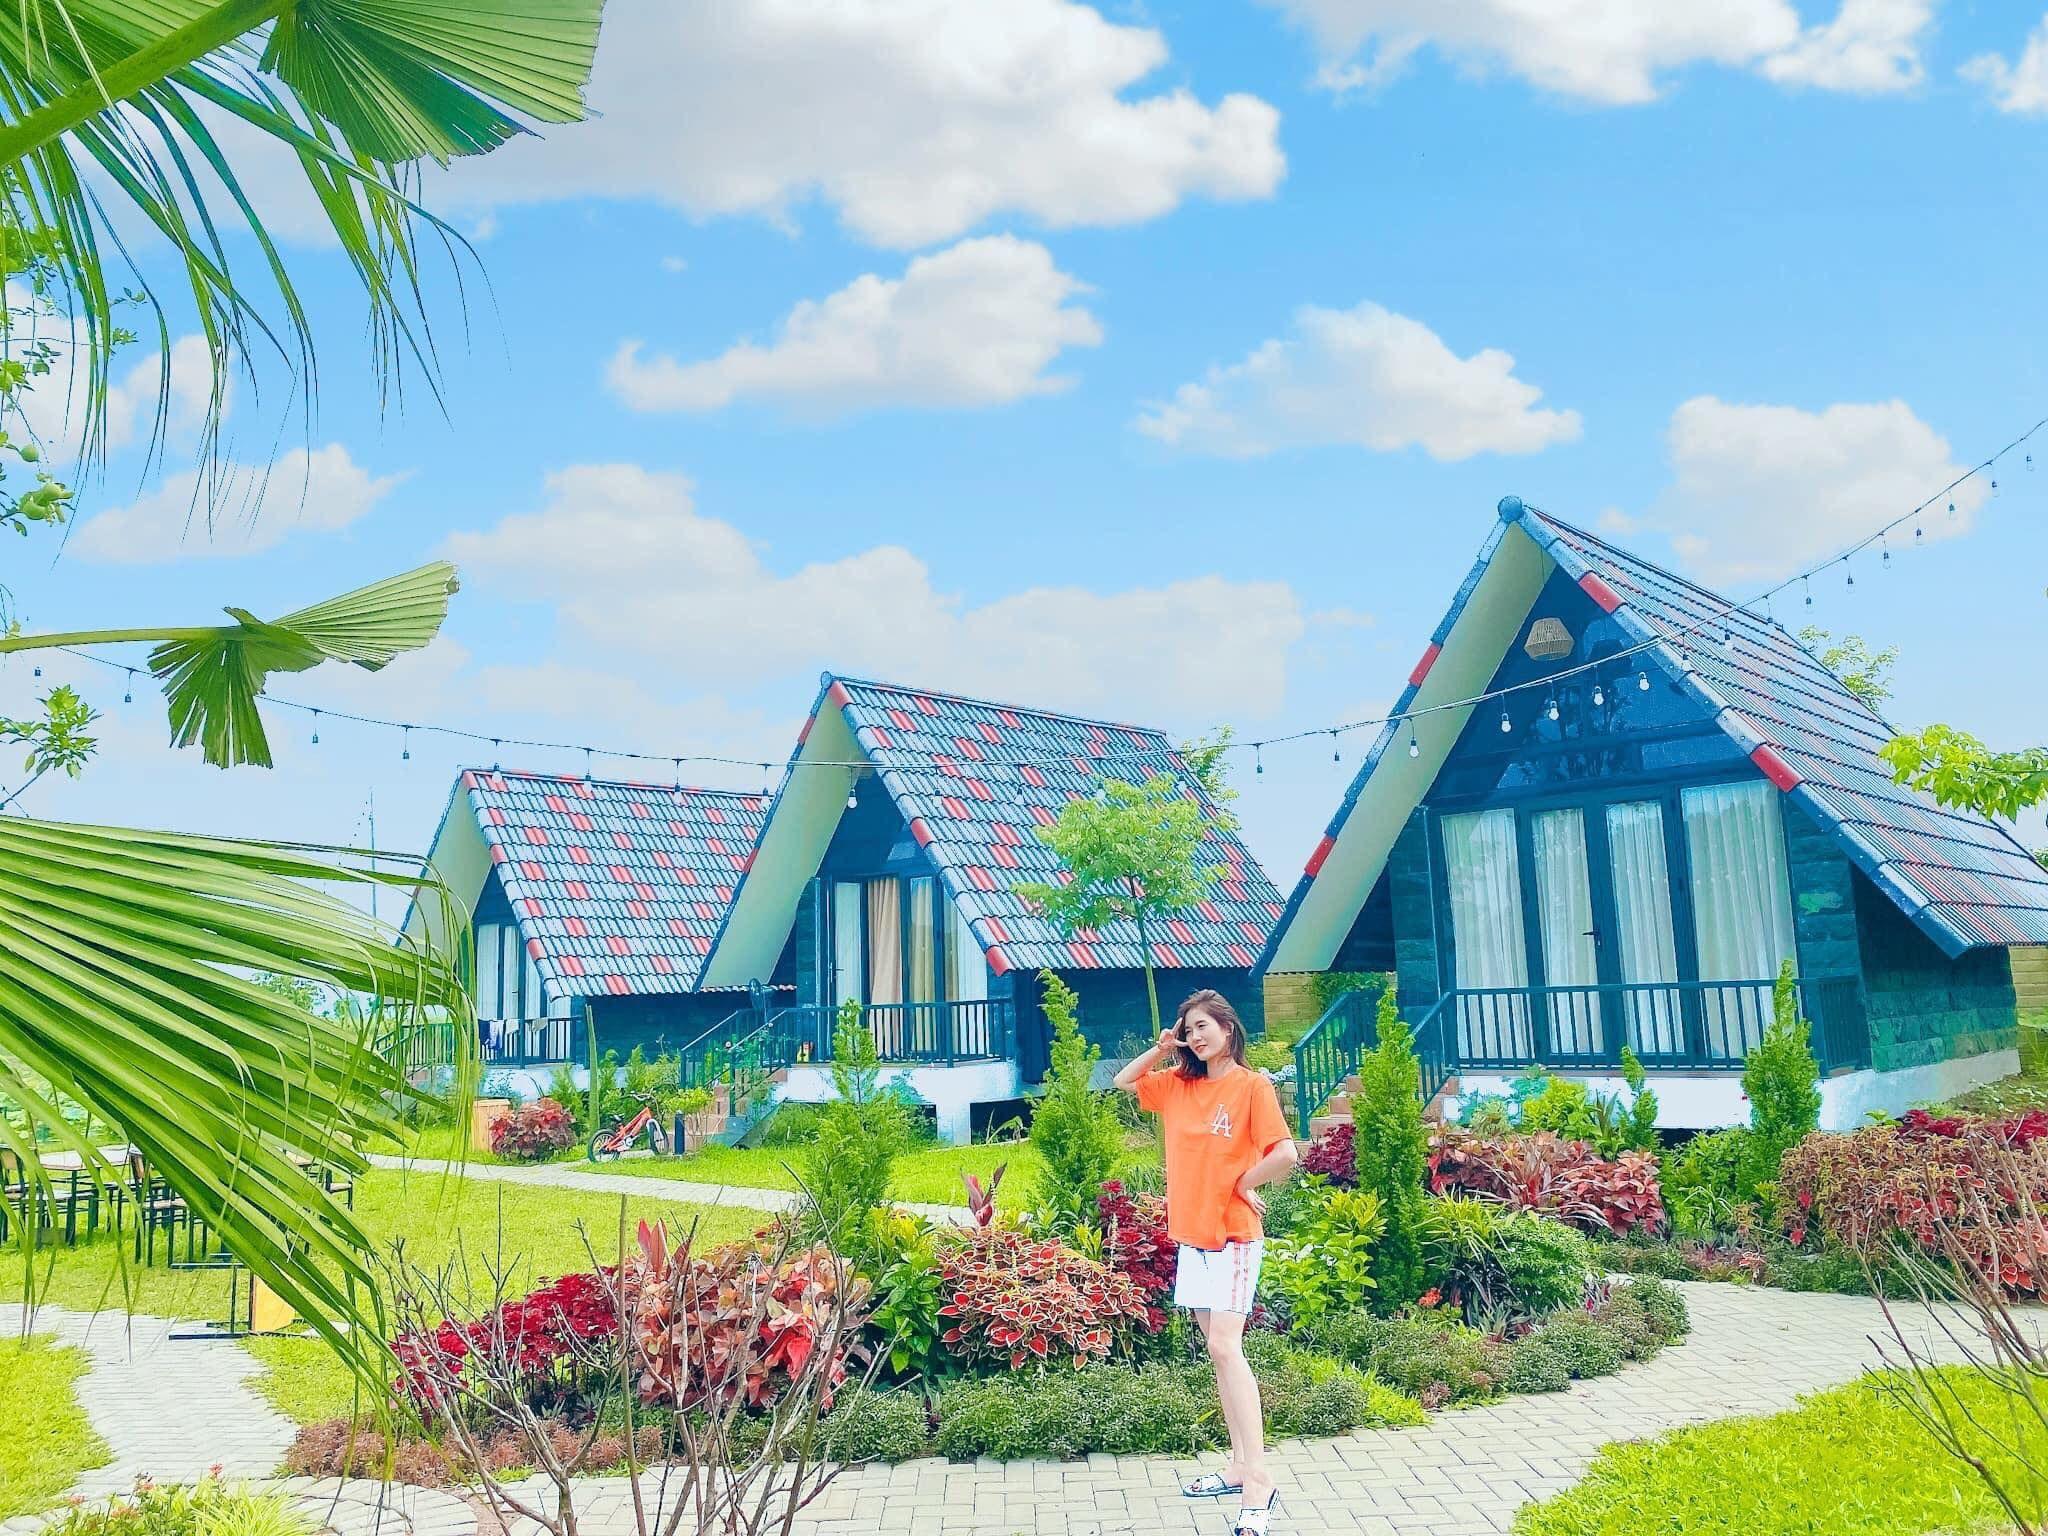 goc-chup-bungalow-sen-villas-homestay-ba-vi-ha-noi